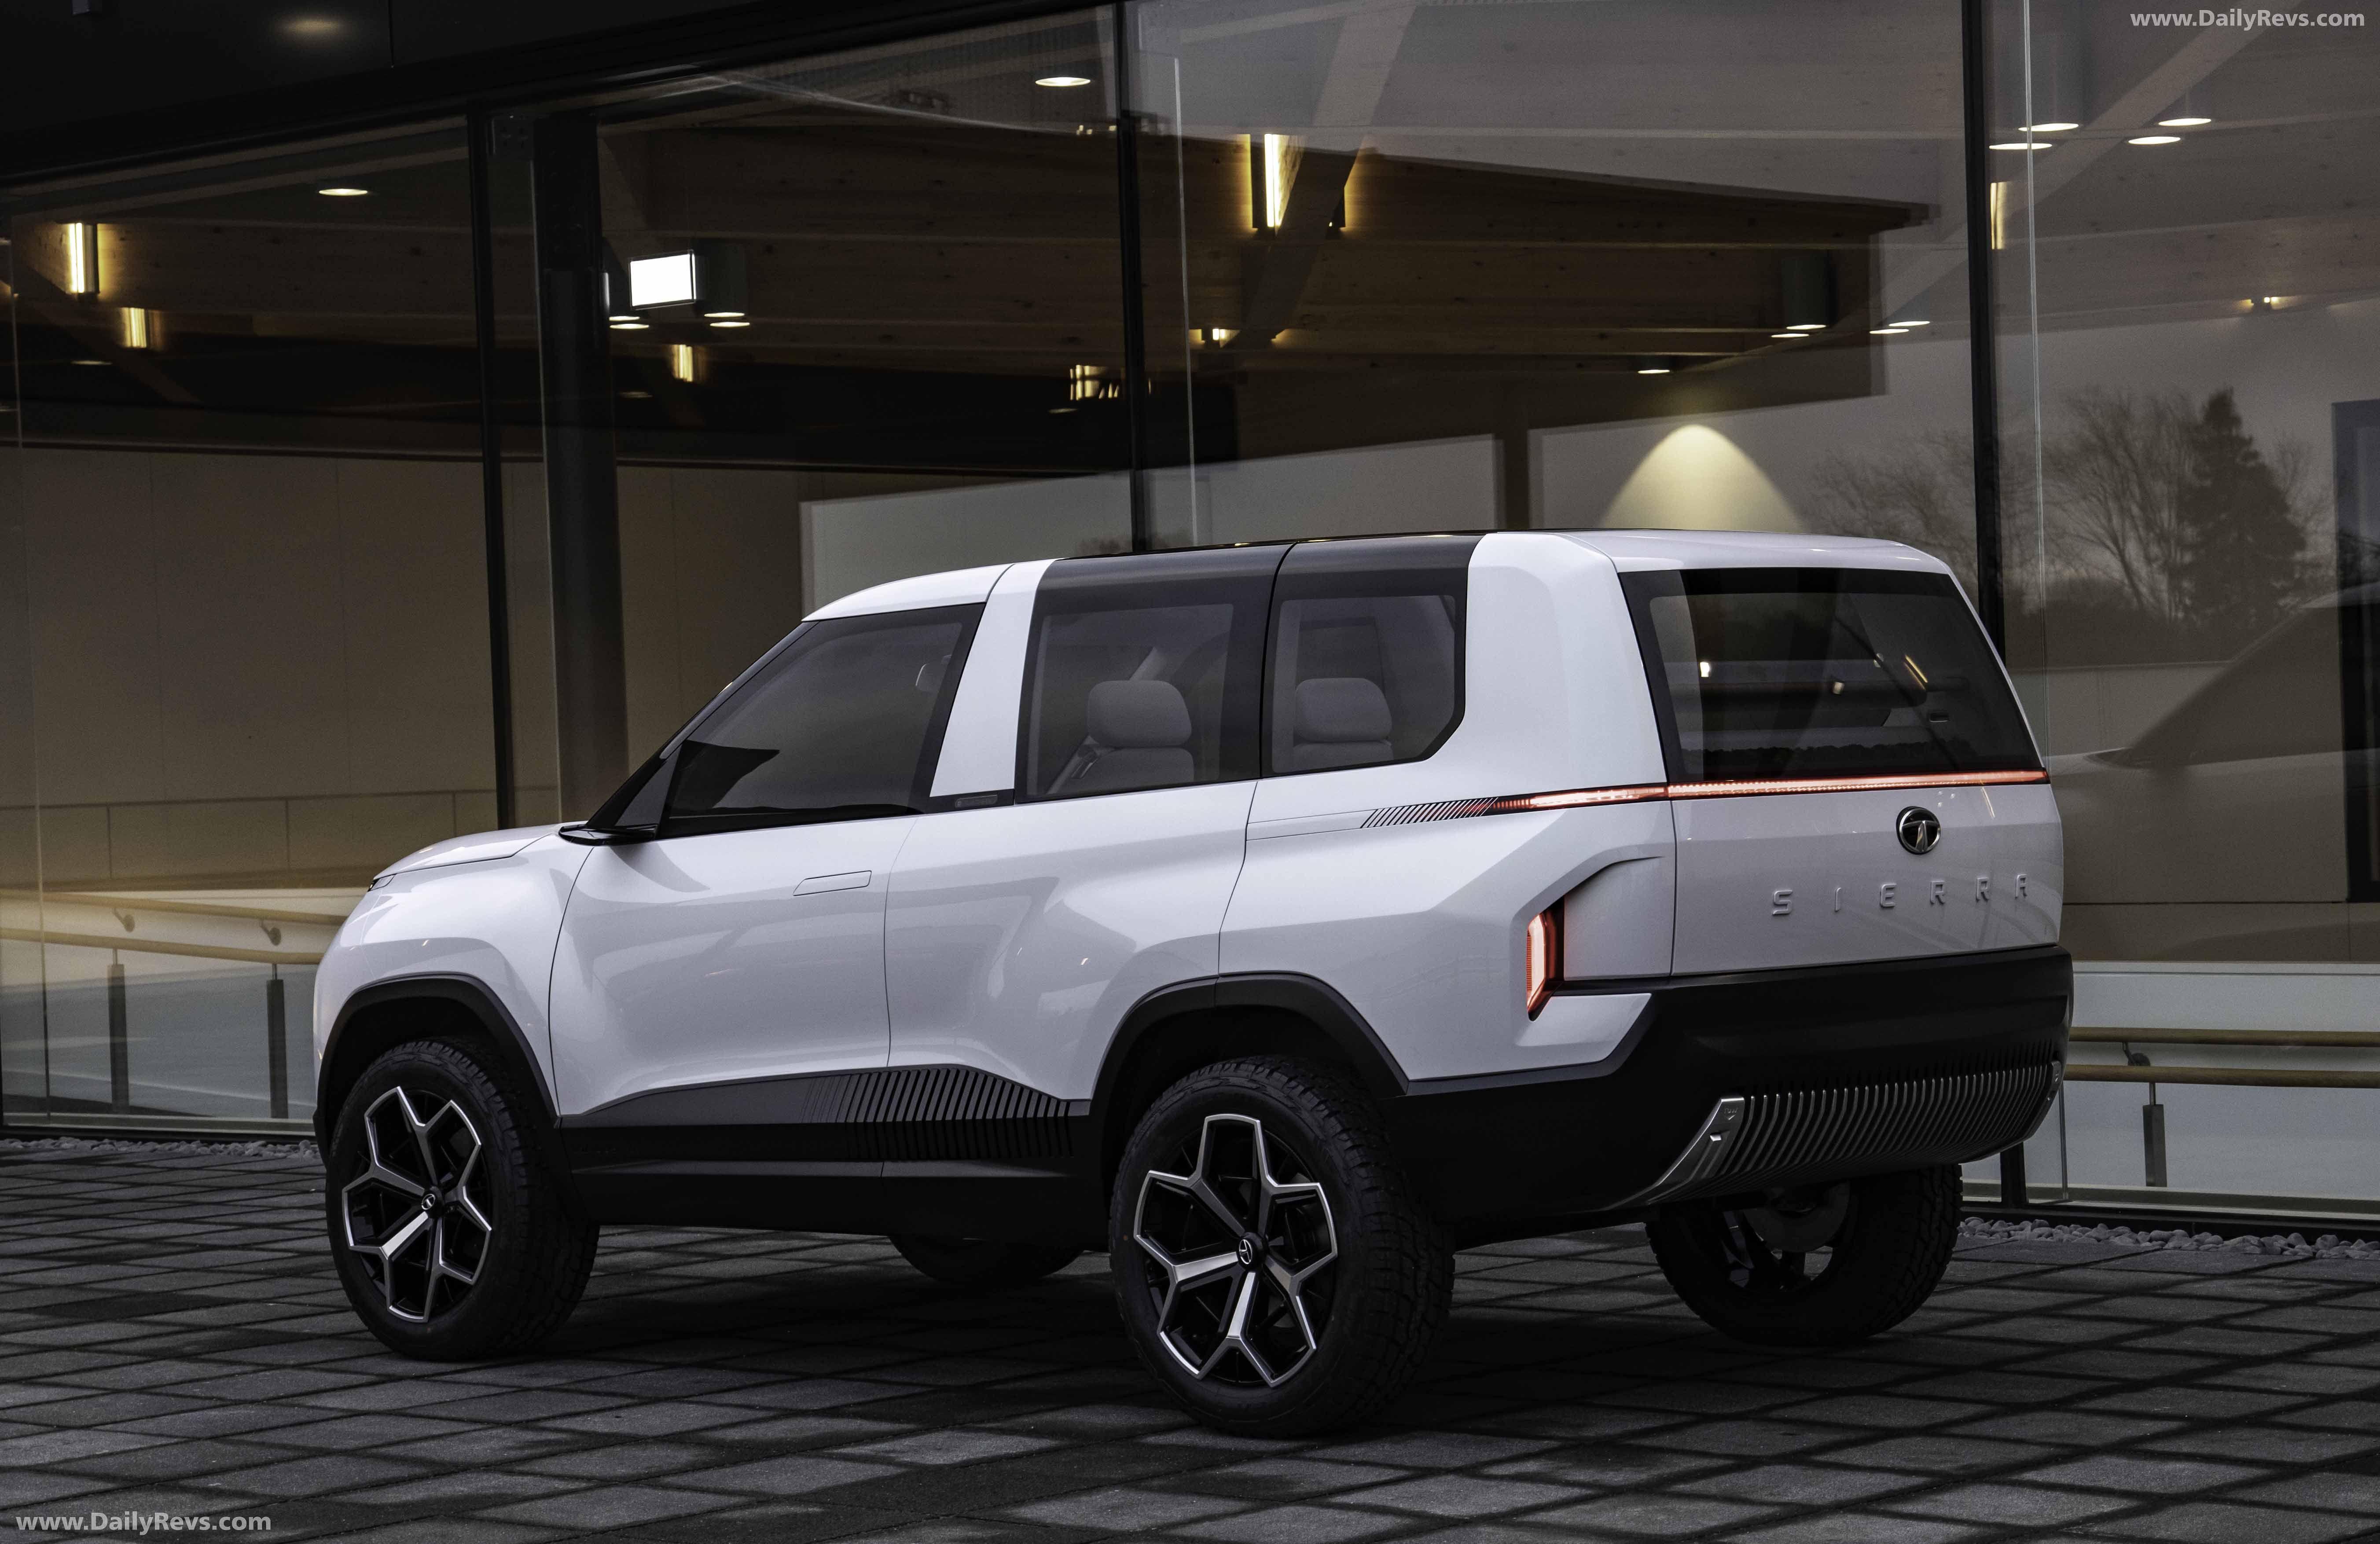 2020 Tata Sierra EV Concept HD Pictures, Videos, Specs